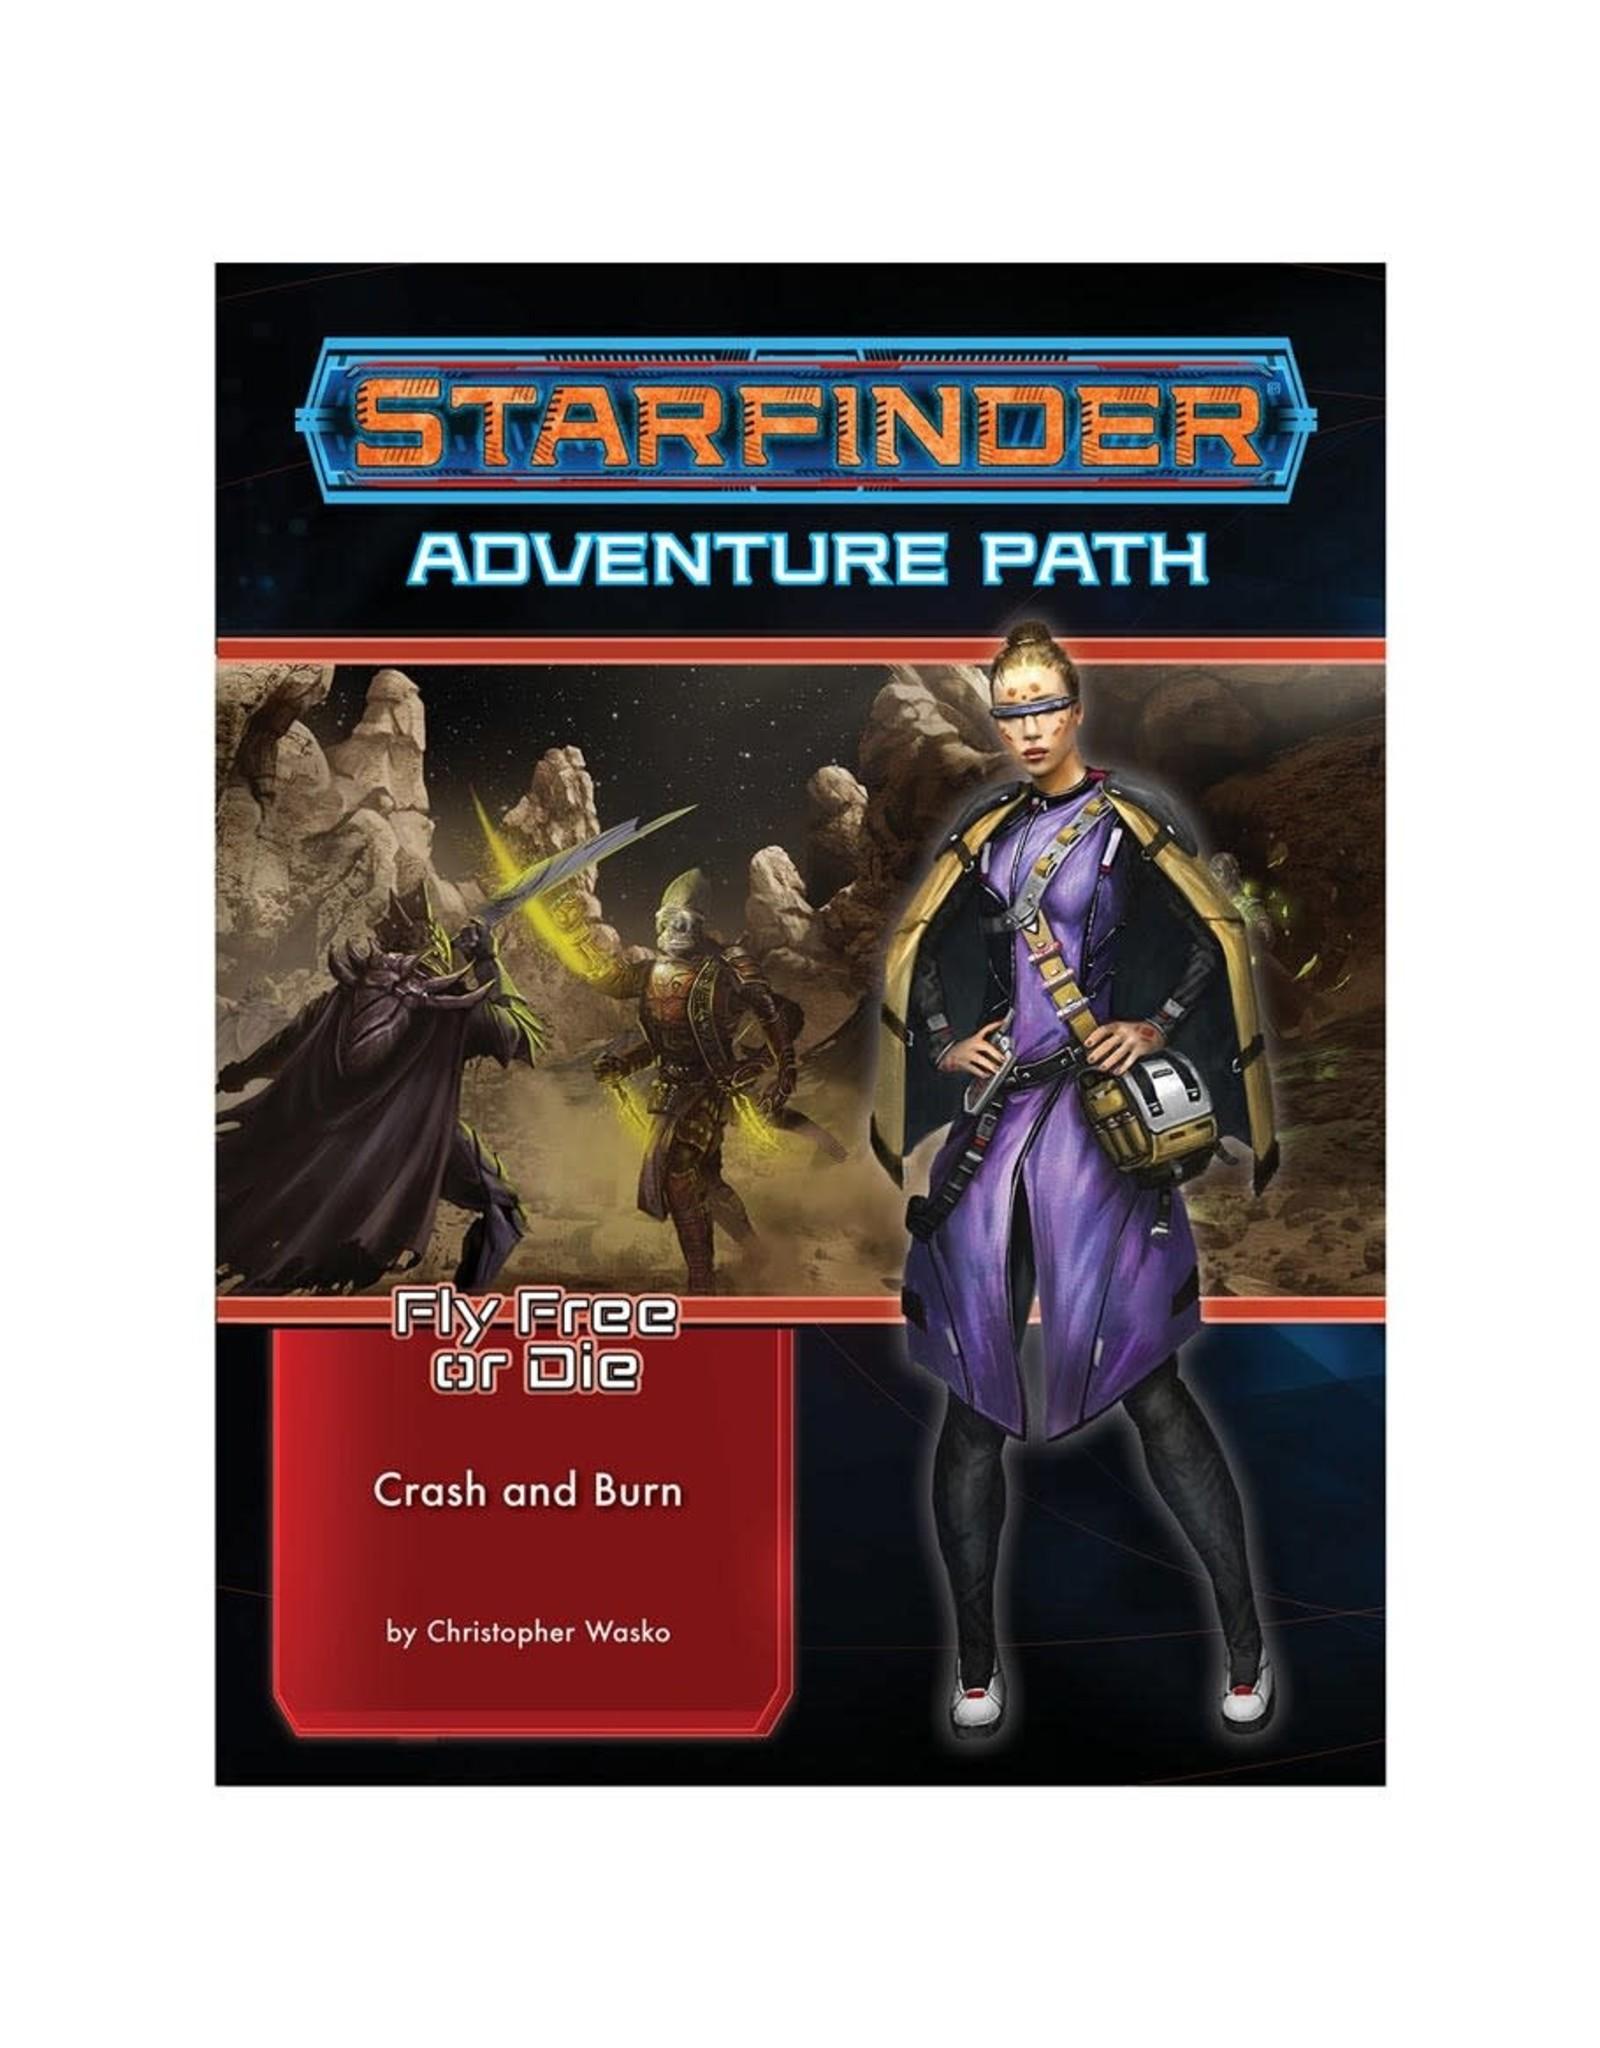 Paizo Starfinder Adventure Path: Fly Free or Die 5 - Crash and Burn